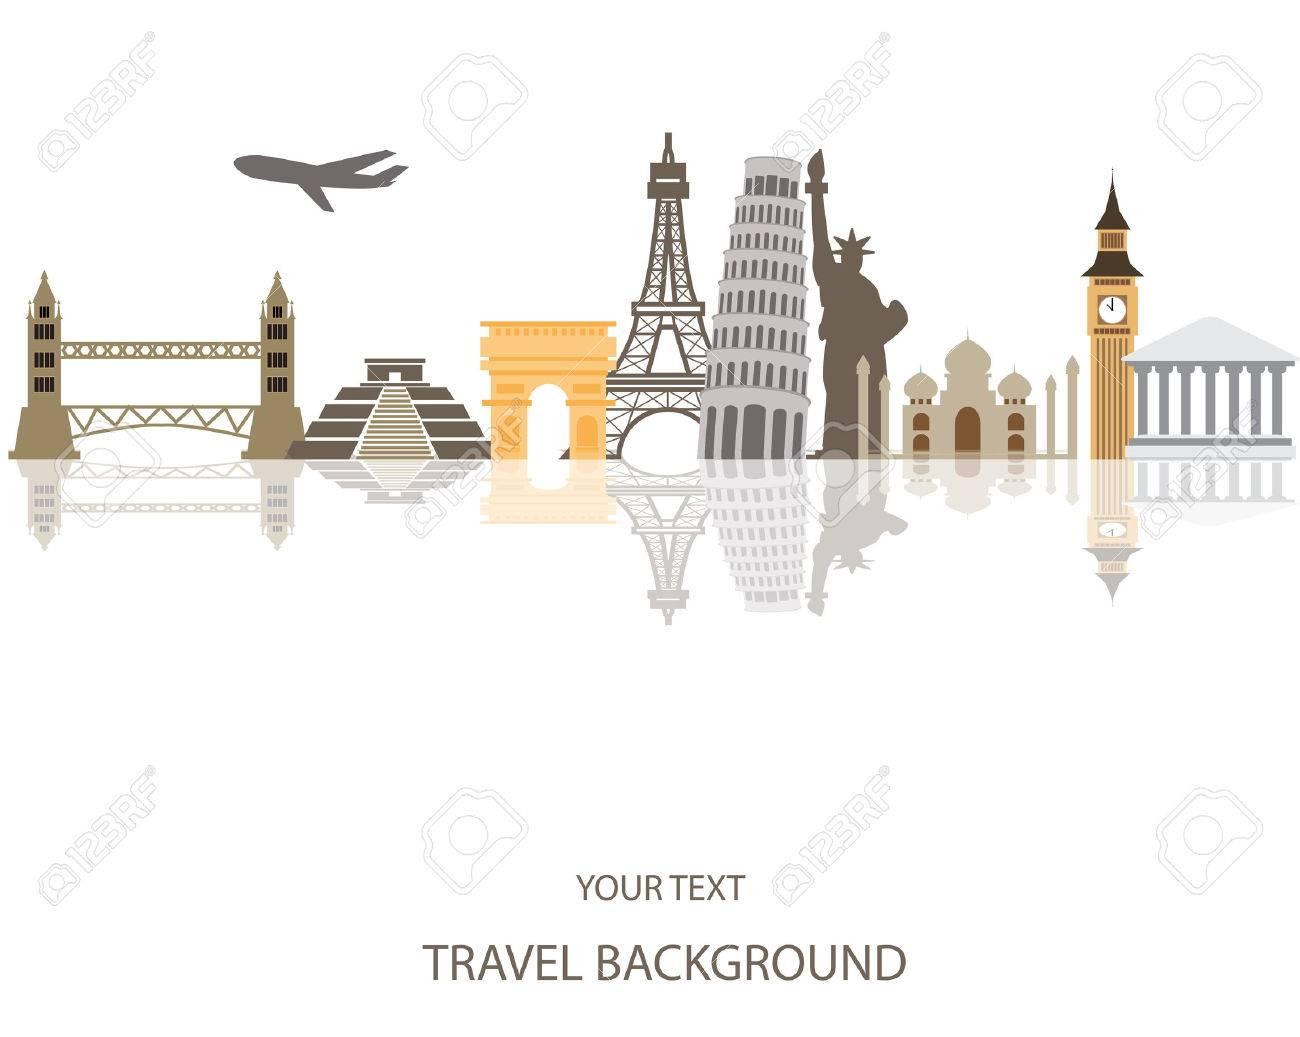 world travel background - 41936452